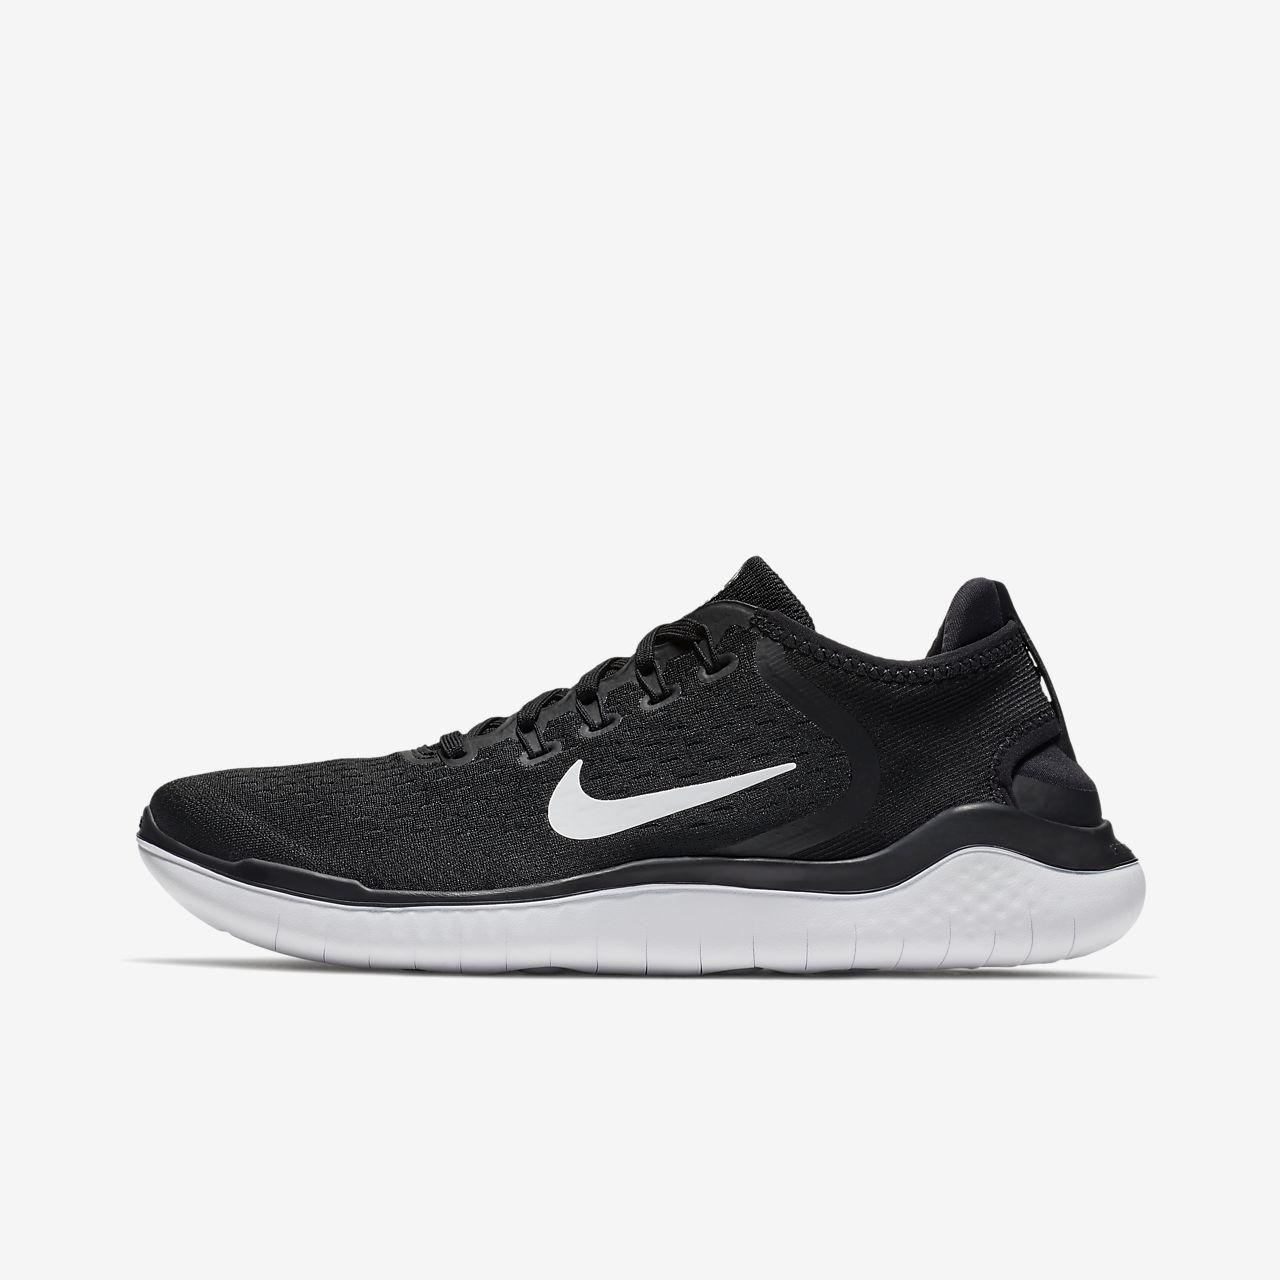 Nike Free RN 2018 Laufschuhe Weiß